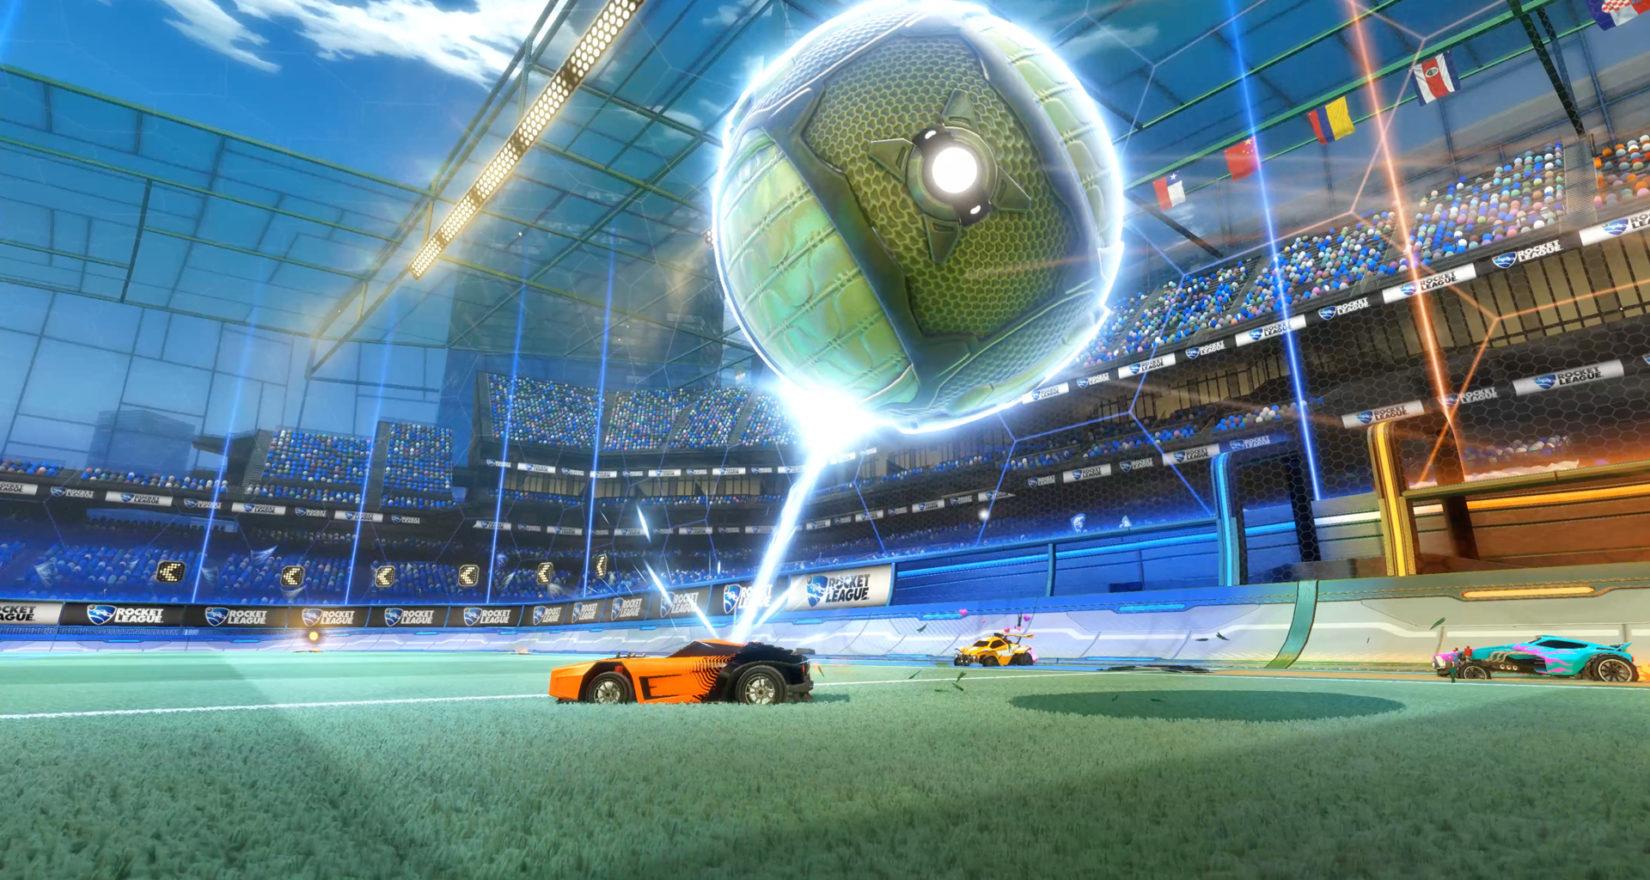 Rocket League is getting a battle royale style Rumble mode next month